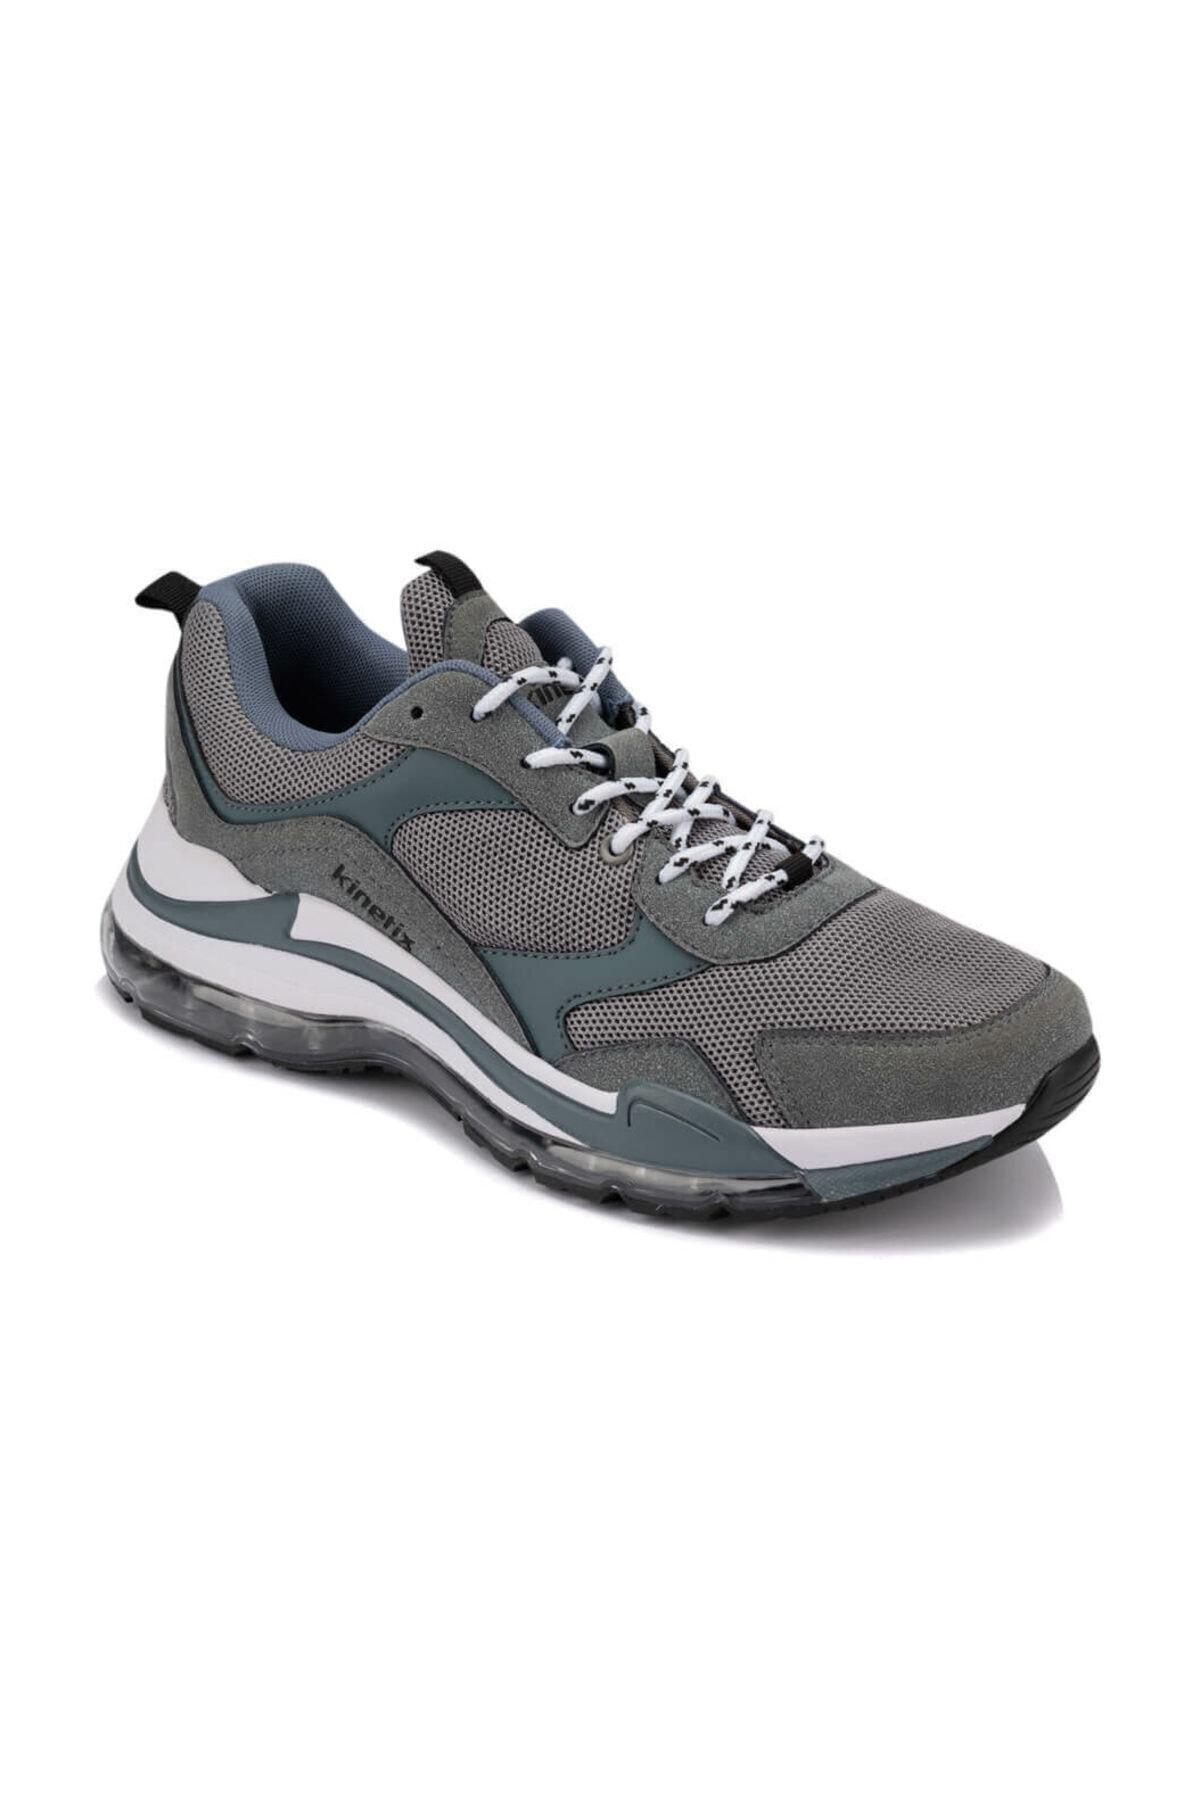 HARLOW 9PR Gri Erkek Sneaker Ayakkabı 100433444